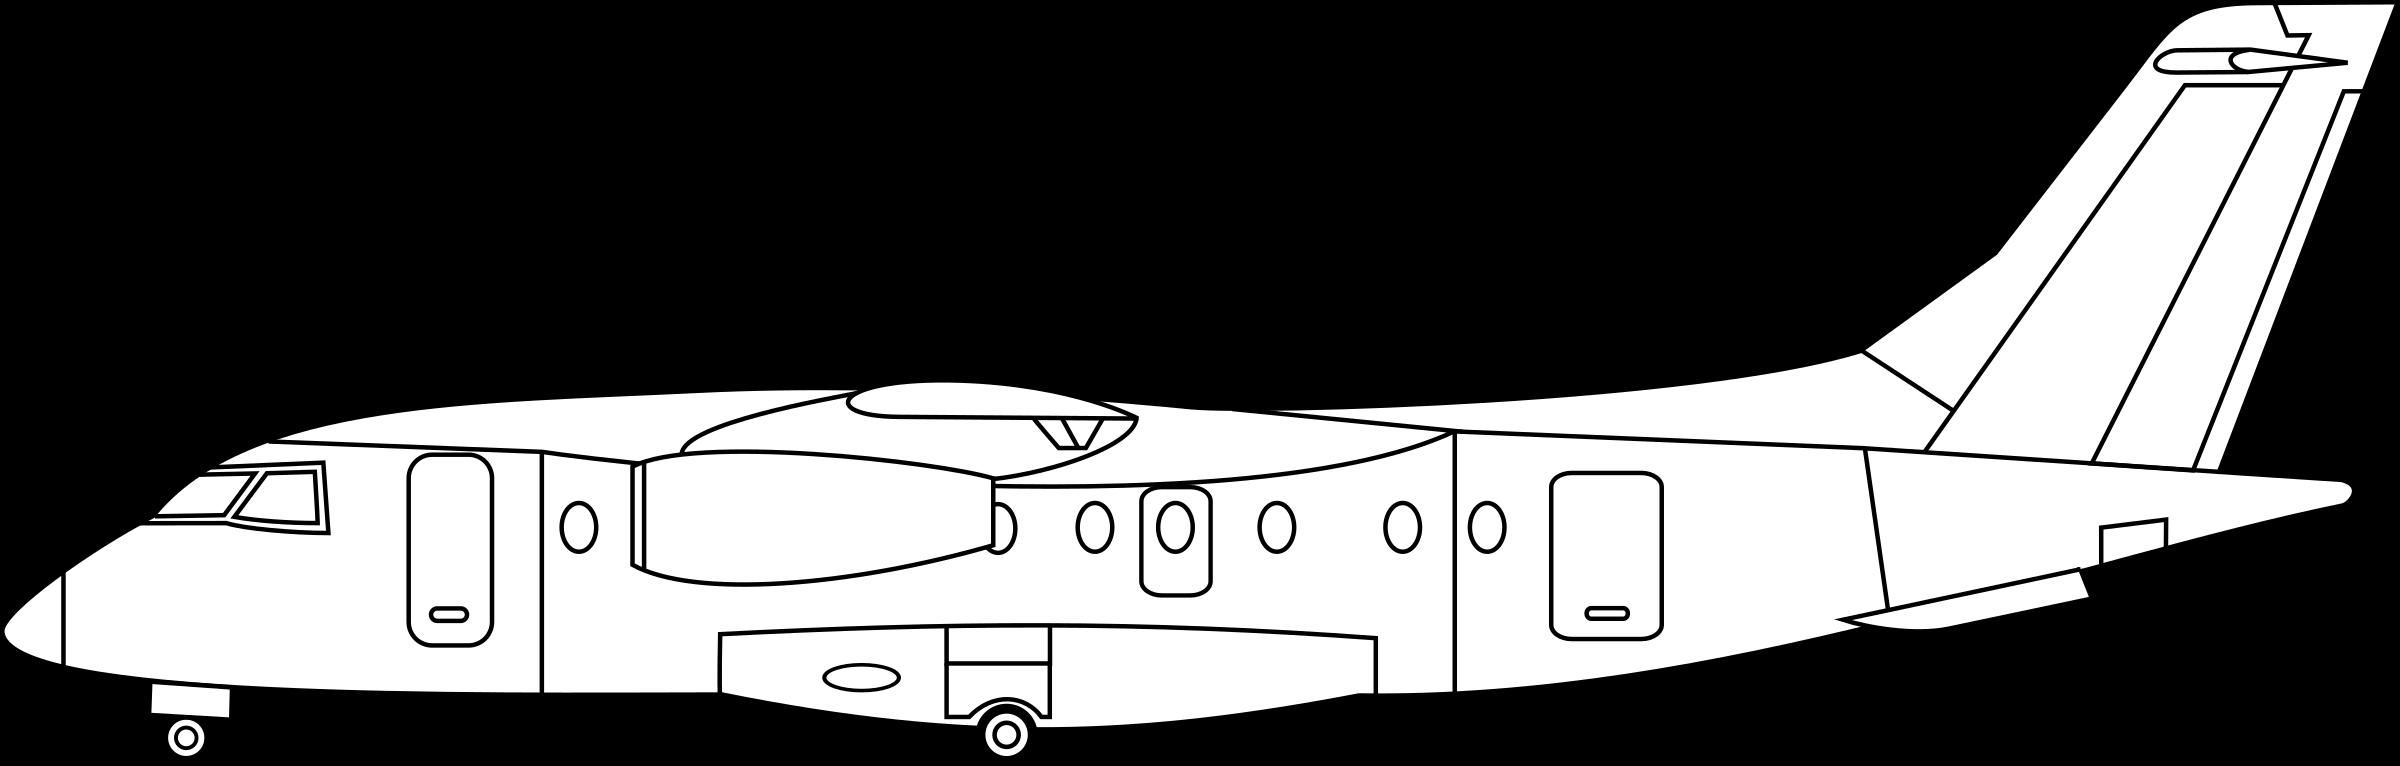 Dornier jet big image. Engine clipart side view